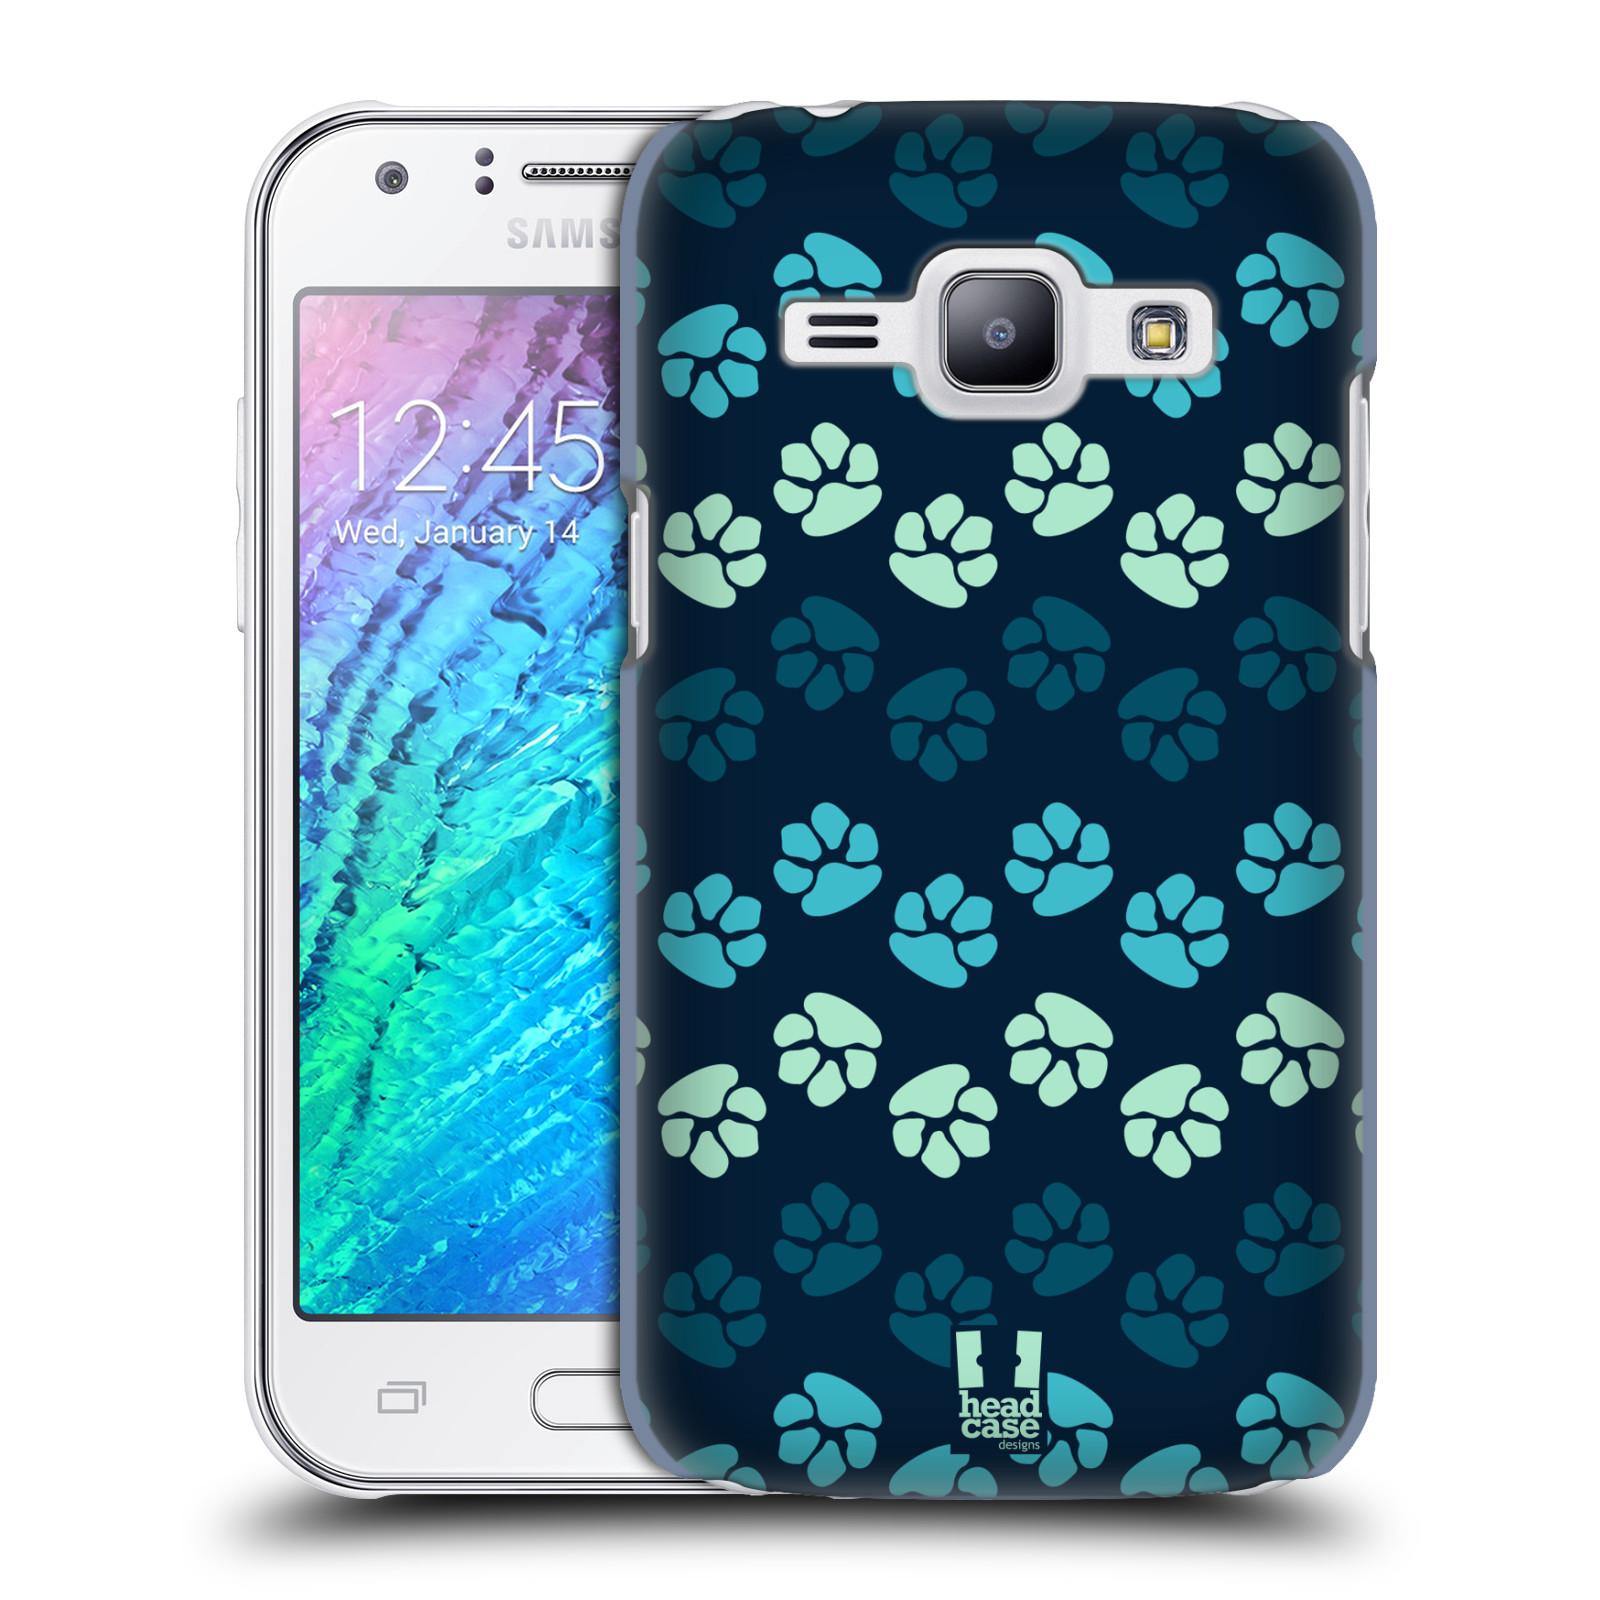 Plastové pouzdro na mobil Samsung Galaxy J1 HEAD CASE TLAPKY MODRÉ (Kryt či obal na mobilní telefon Samsung Galaxy J1 a J1 Duos )